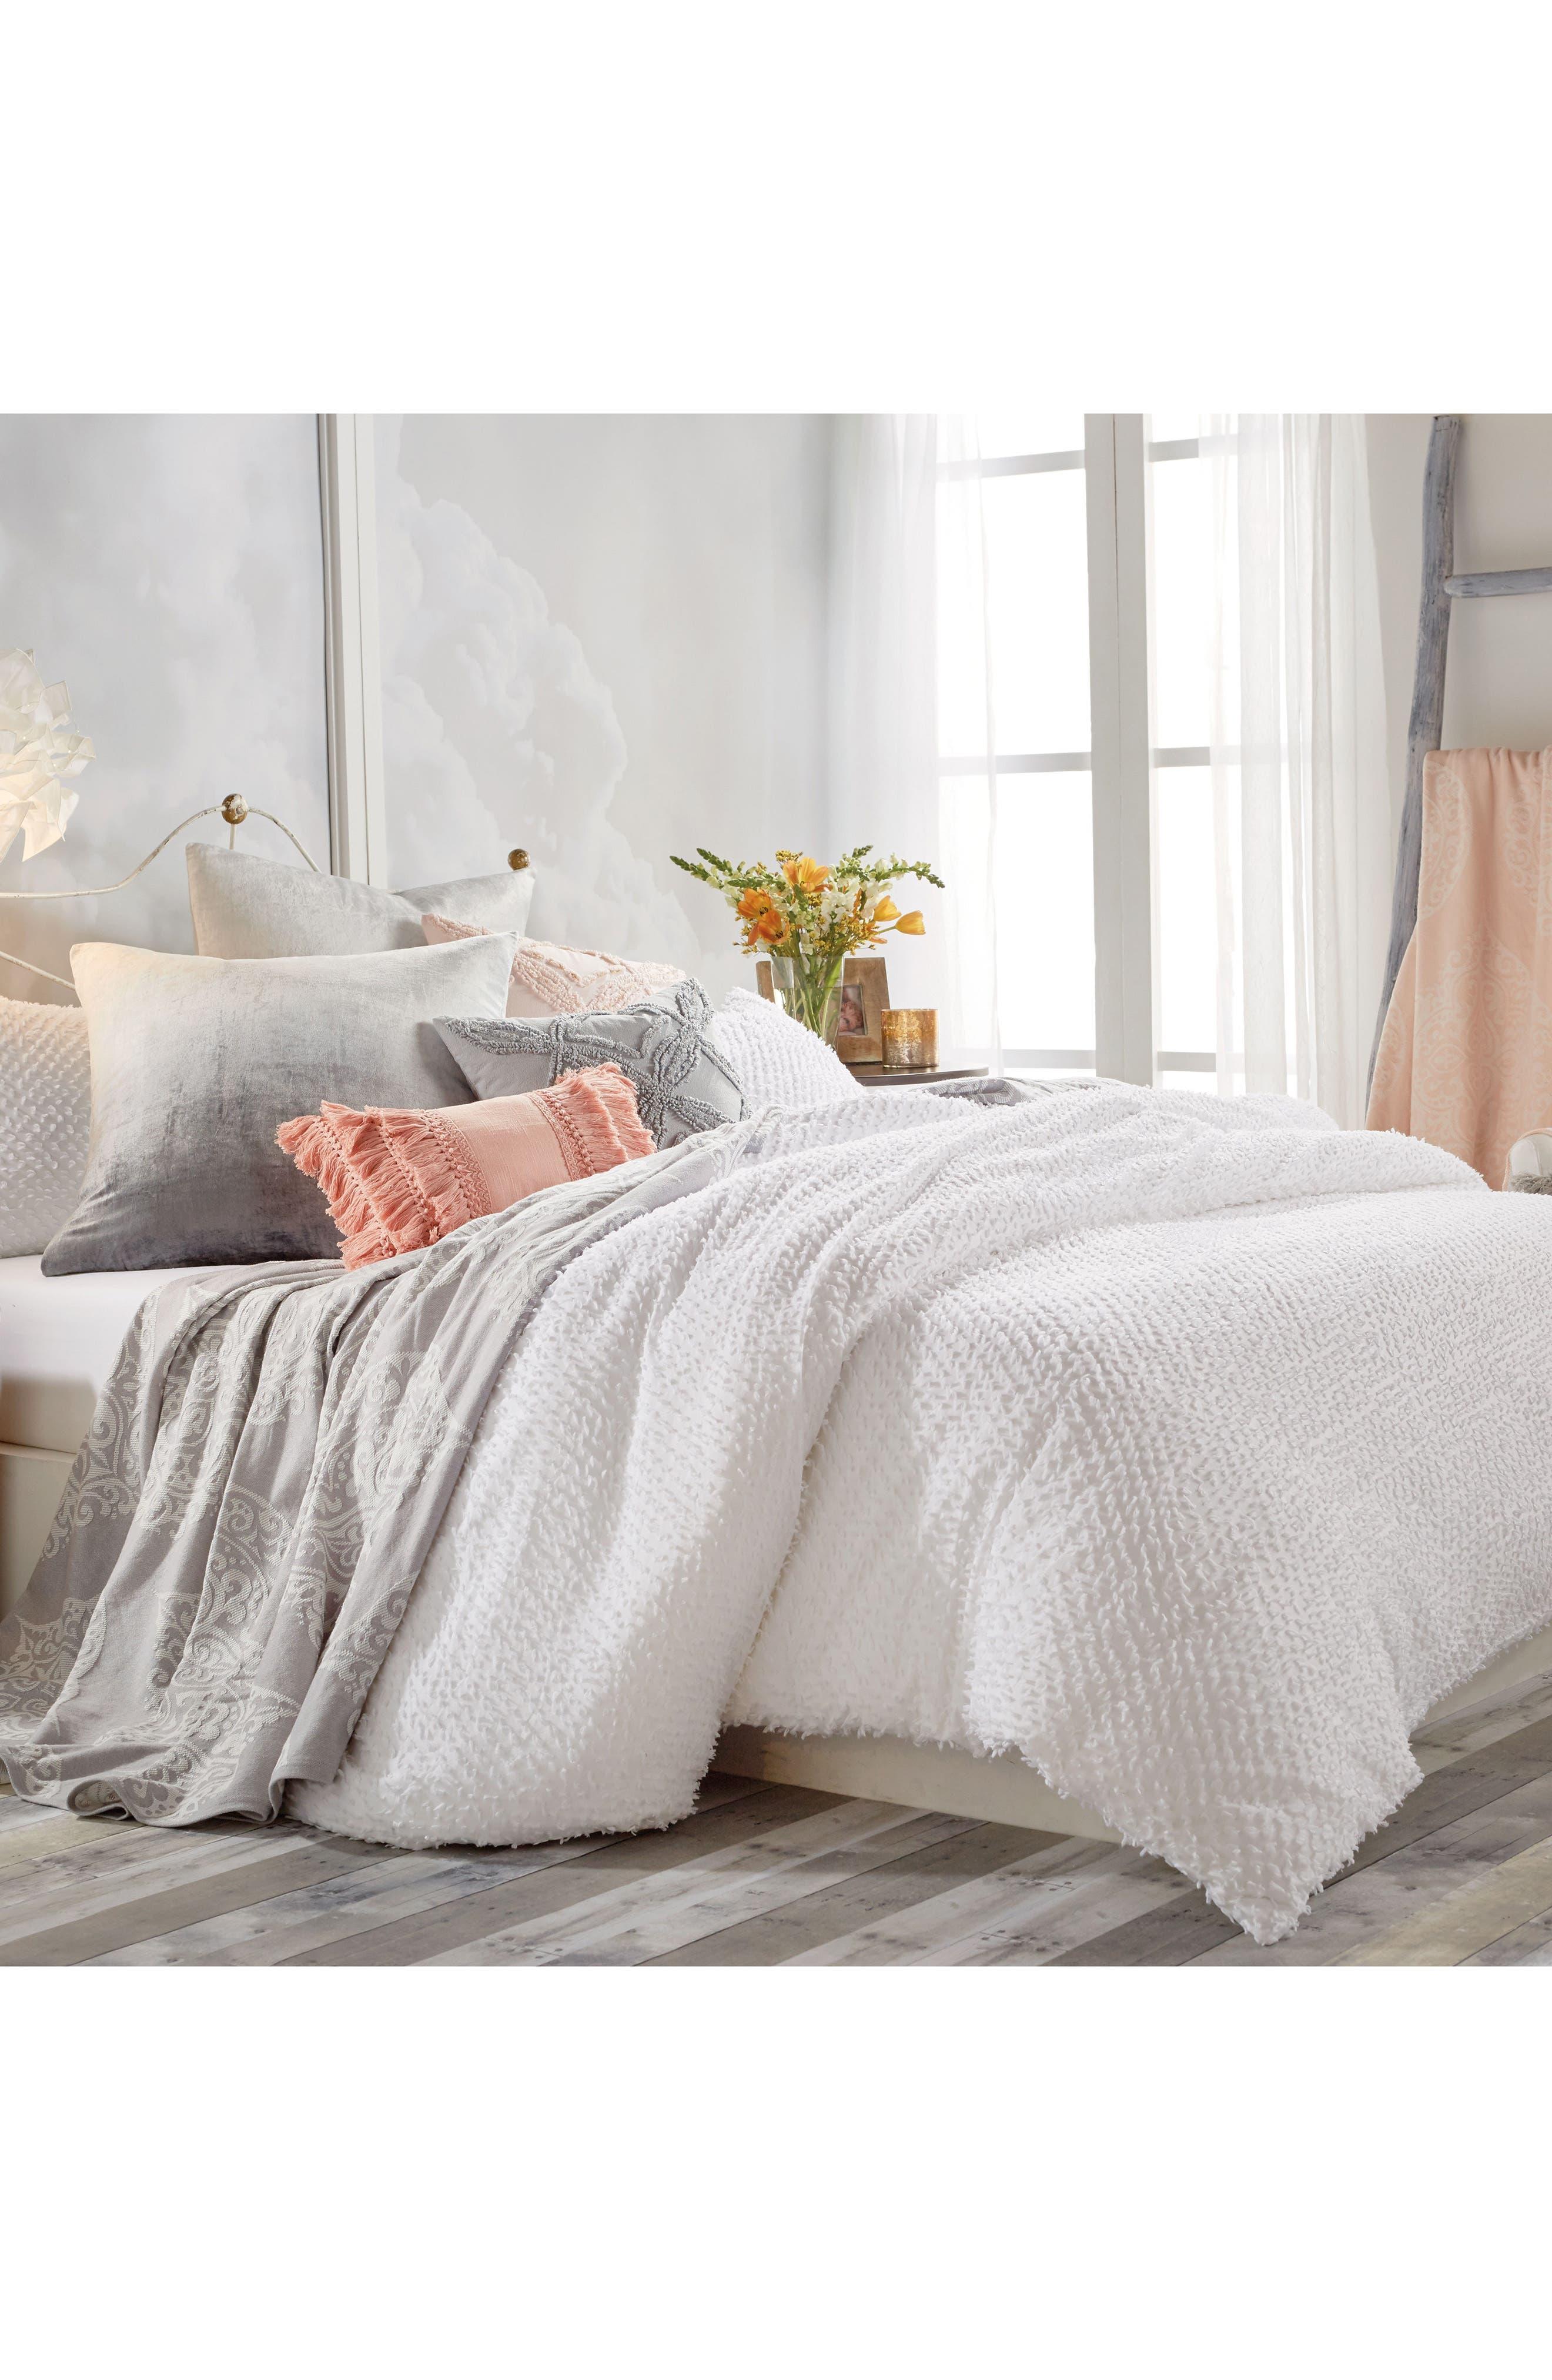 up bedding dressed com quilt duvet set walmart waverly scallop cover scalloped damask ip